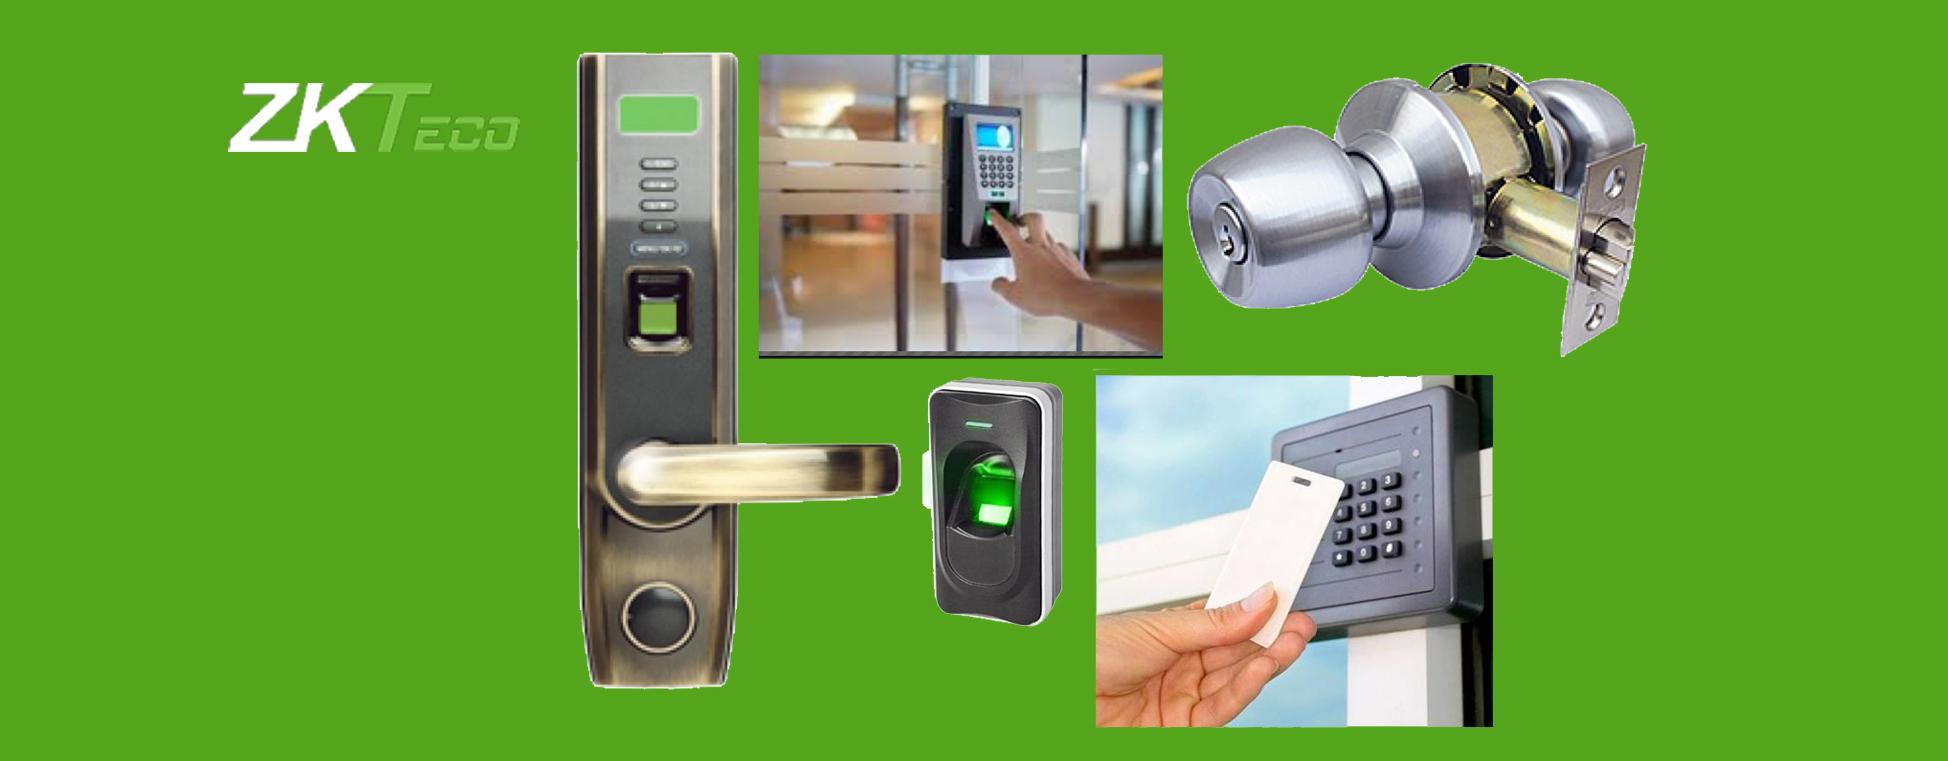 Door-Access-Control-bio-metric-Time-Attendance